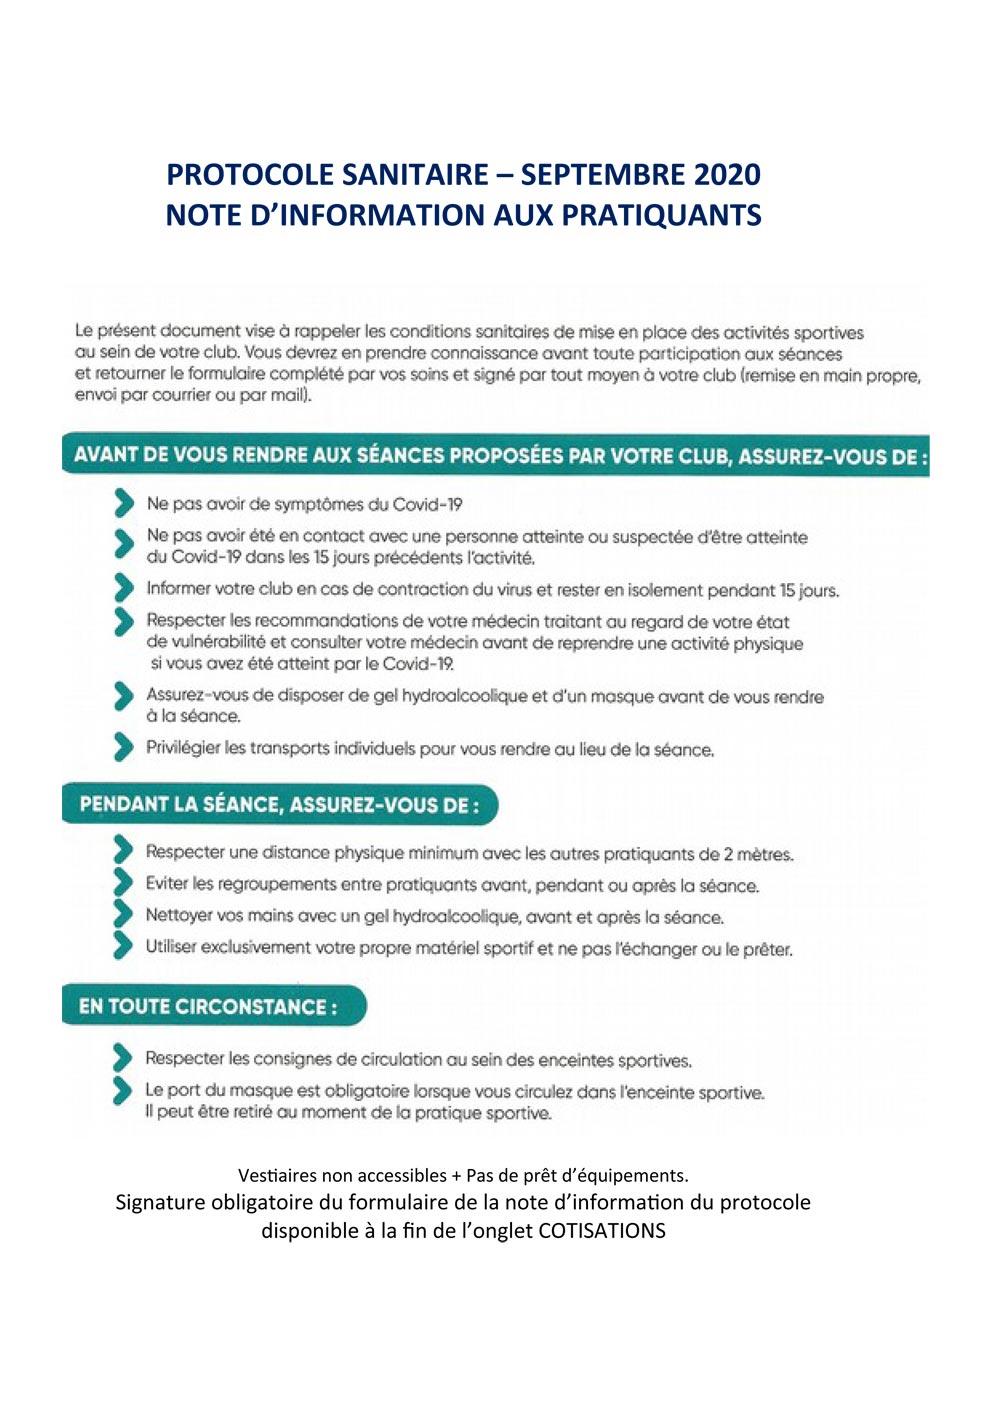 AGV Pernes protocole sanitaire